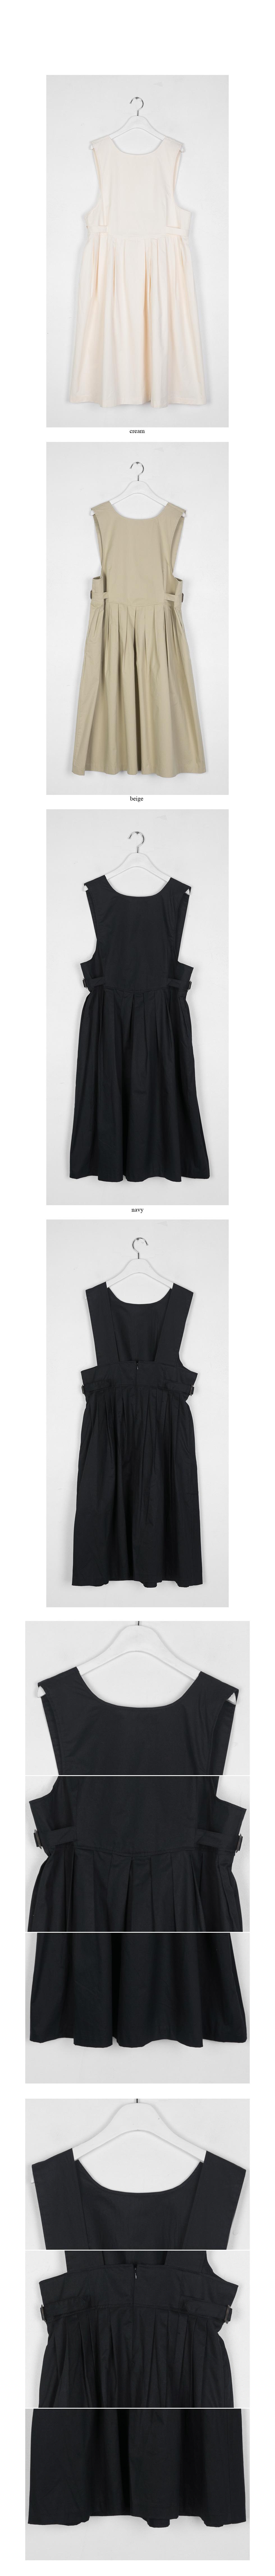 girlhood cotton dress